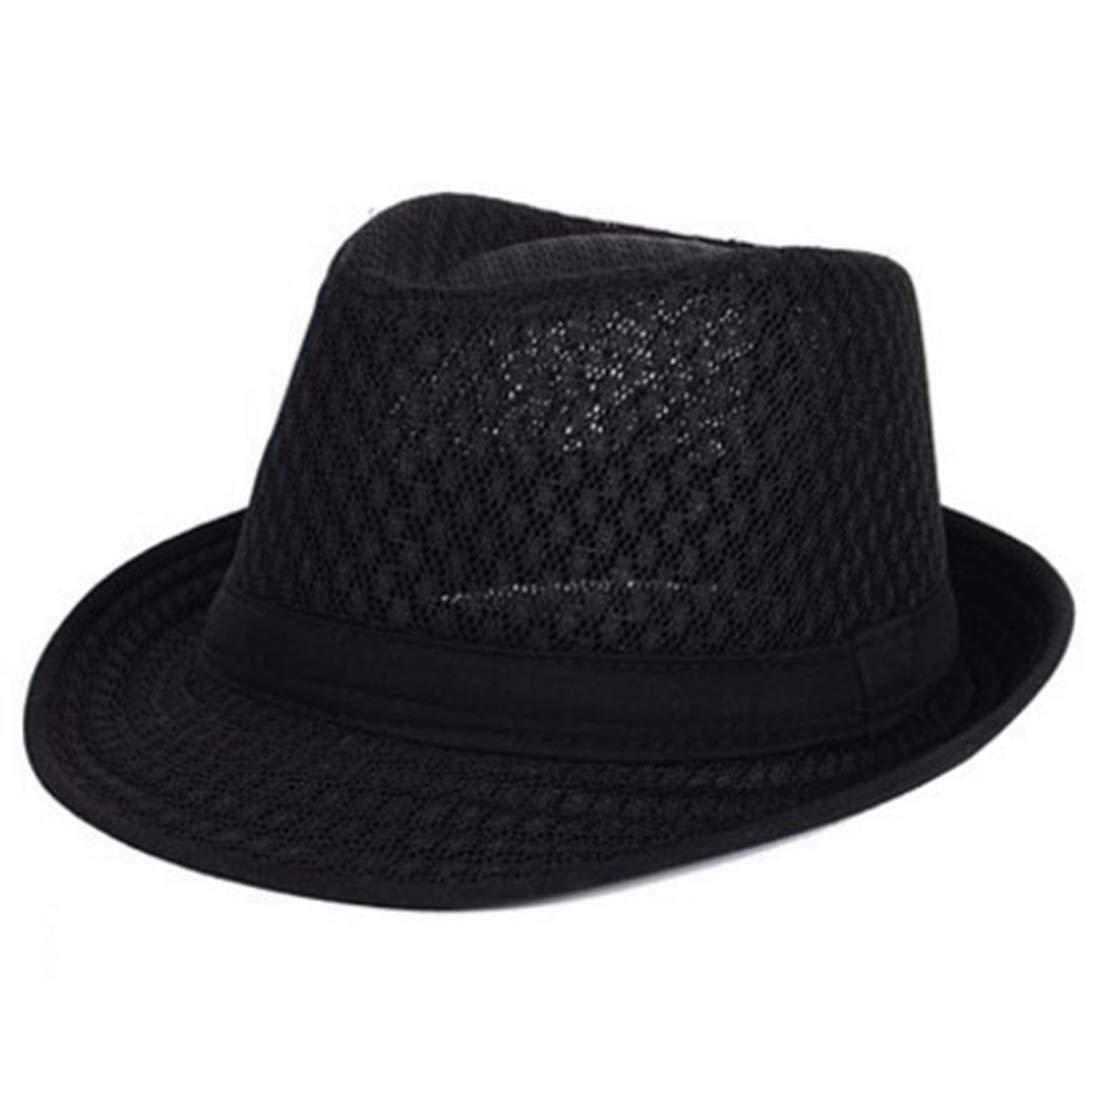 Summer Cool Woven Straw Fedora Hats Unisex Classic Short Brim Panama Hat Beach Sun Hat with Band